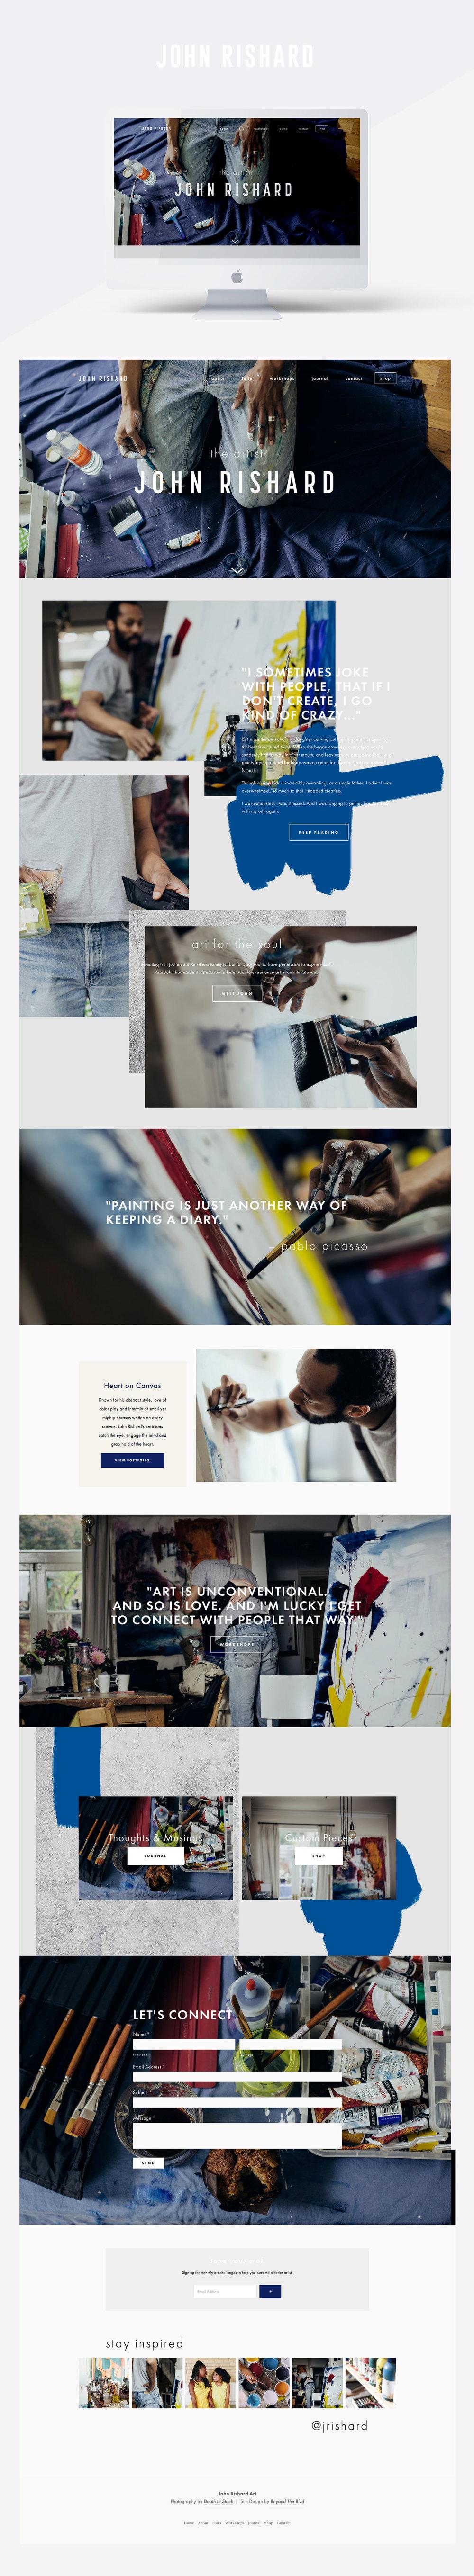 beyond-the-blvd-design-custom-website-artist-painter.jpg